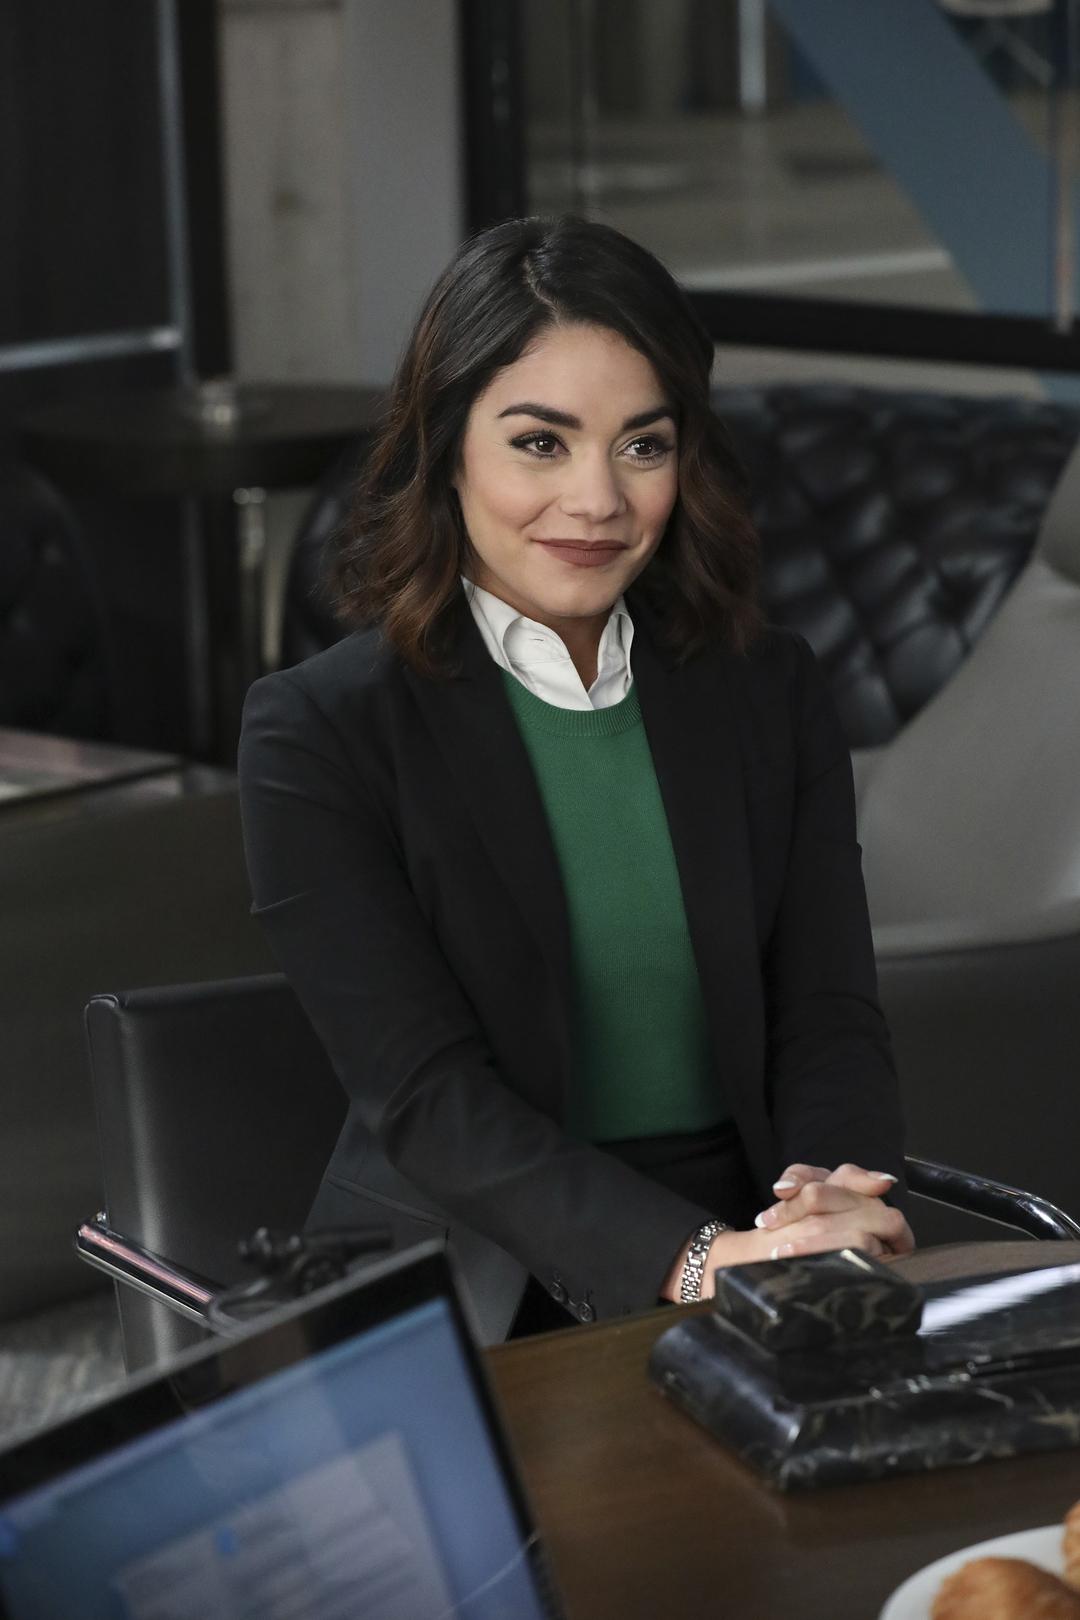 Powerless: l'attrice Vanessa Hudgens in una foto della serie